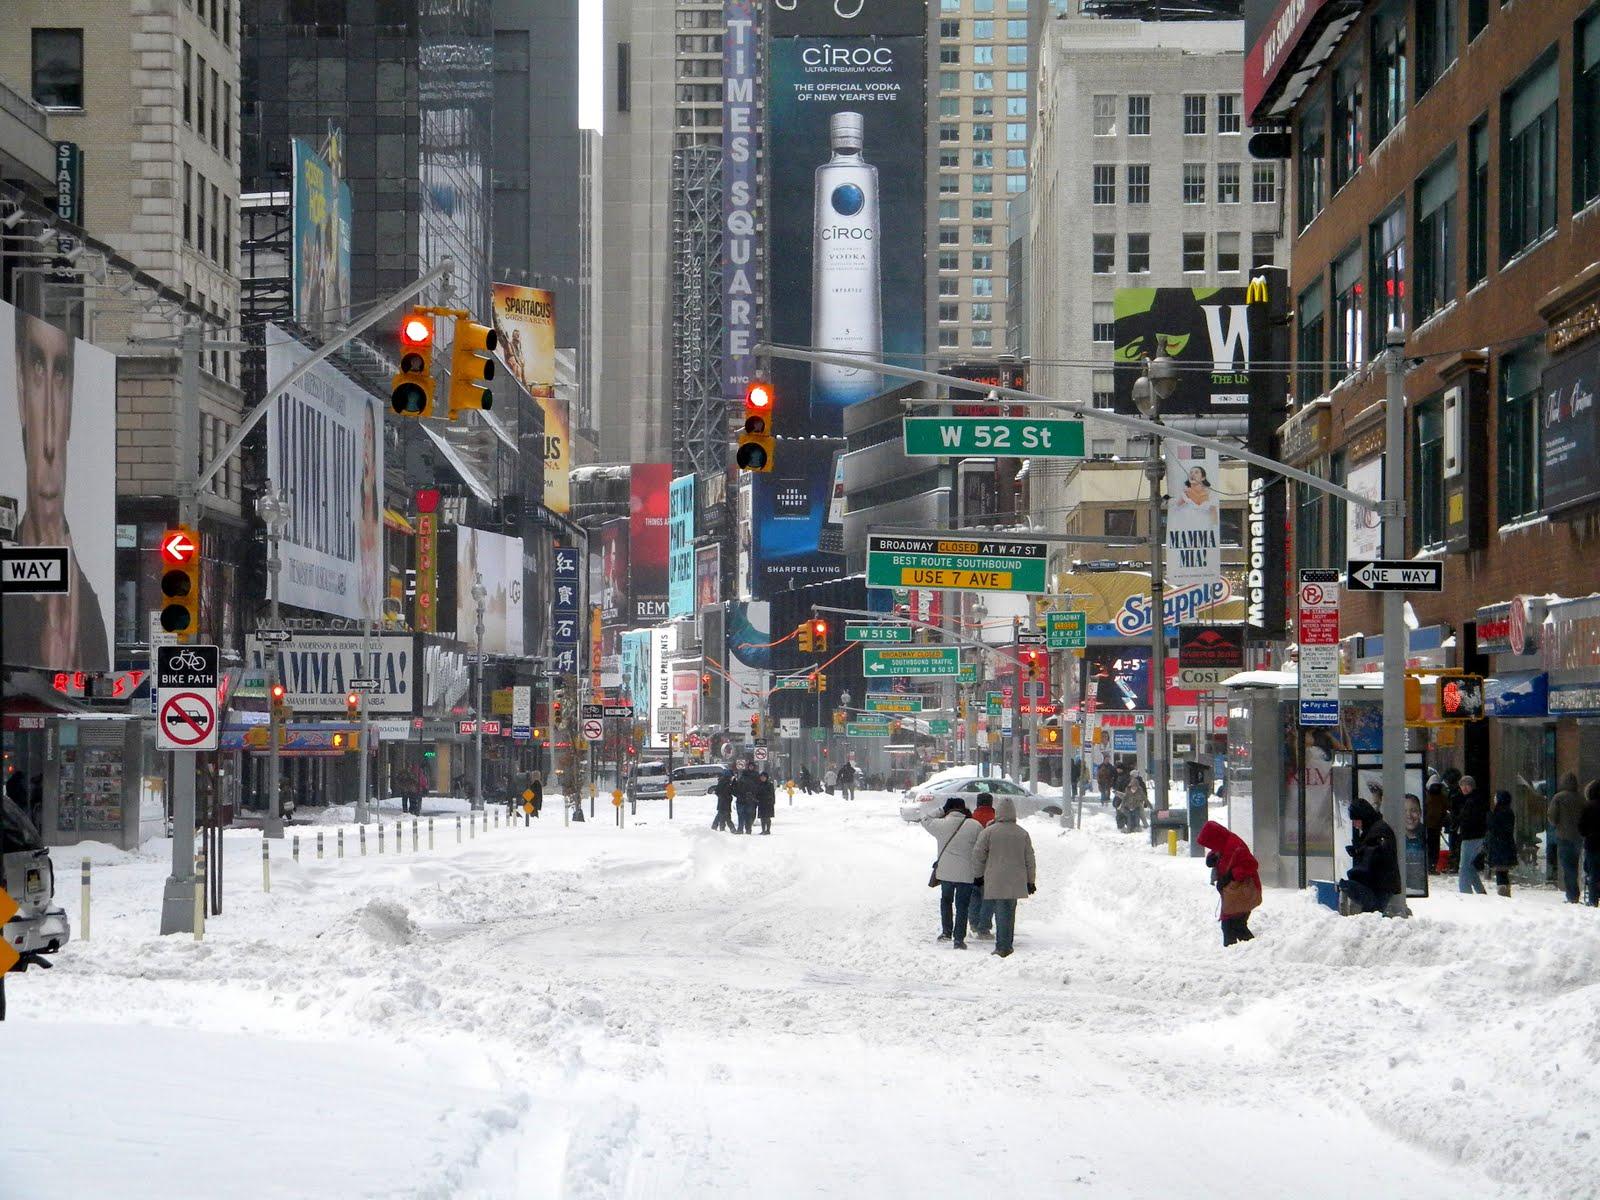 winter-snow-storm-new-york-city-times-sq